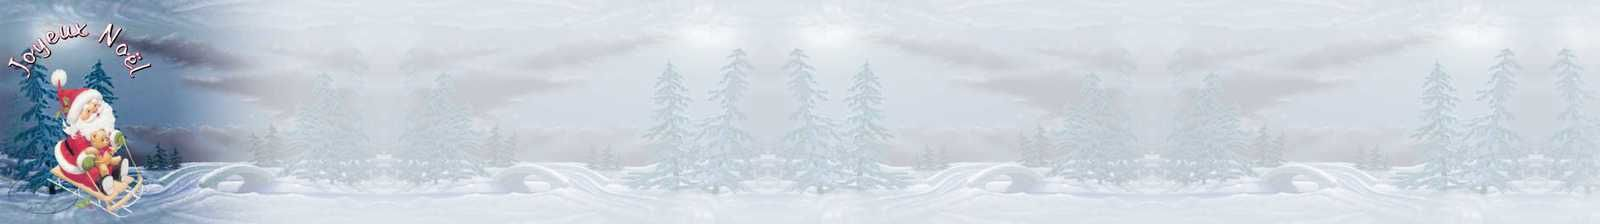 Joyeux Noël Incredimail &amp&#x3B; Papier A4 h l &amp&#x3B; outlook &amp&#x3B; enveloppe &amp&#x3B; 2 cartes A5 &amp&#x3B; signets  joyeux_noel_cid_x_ma11